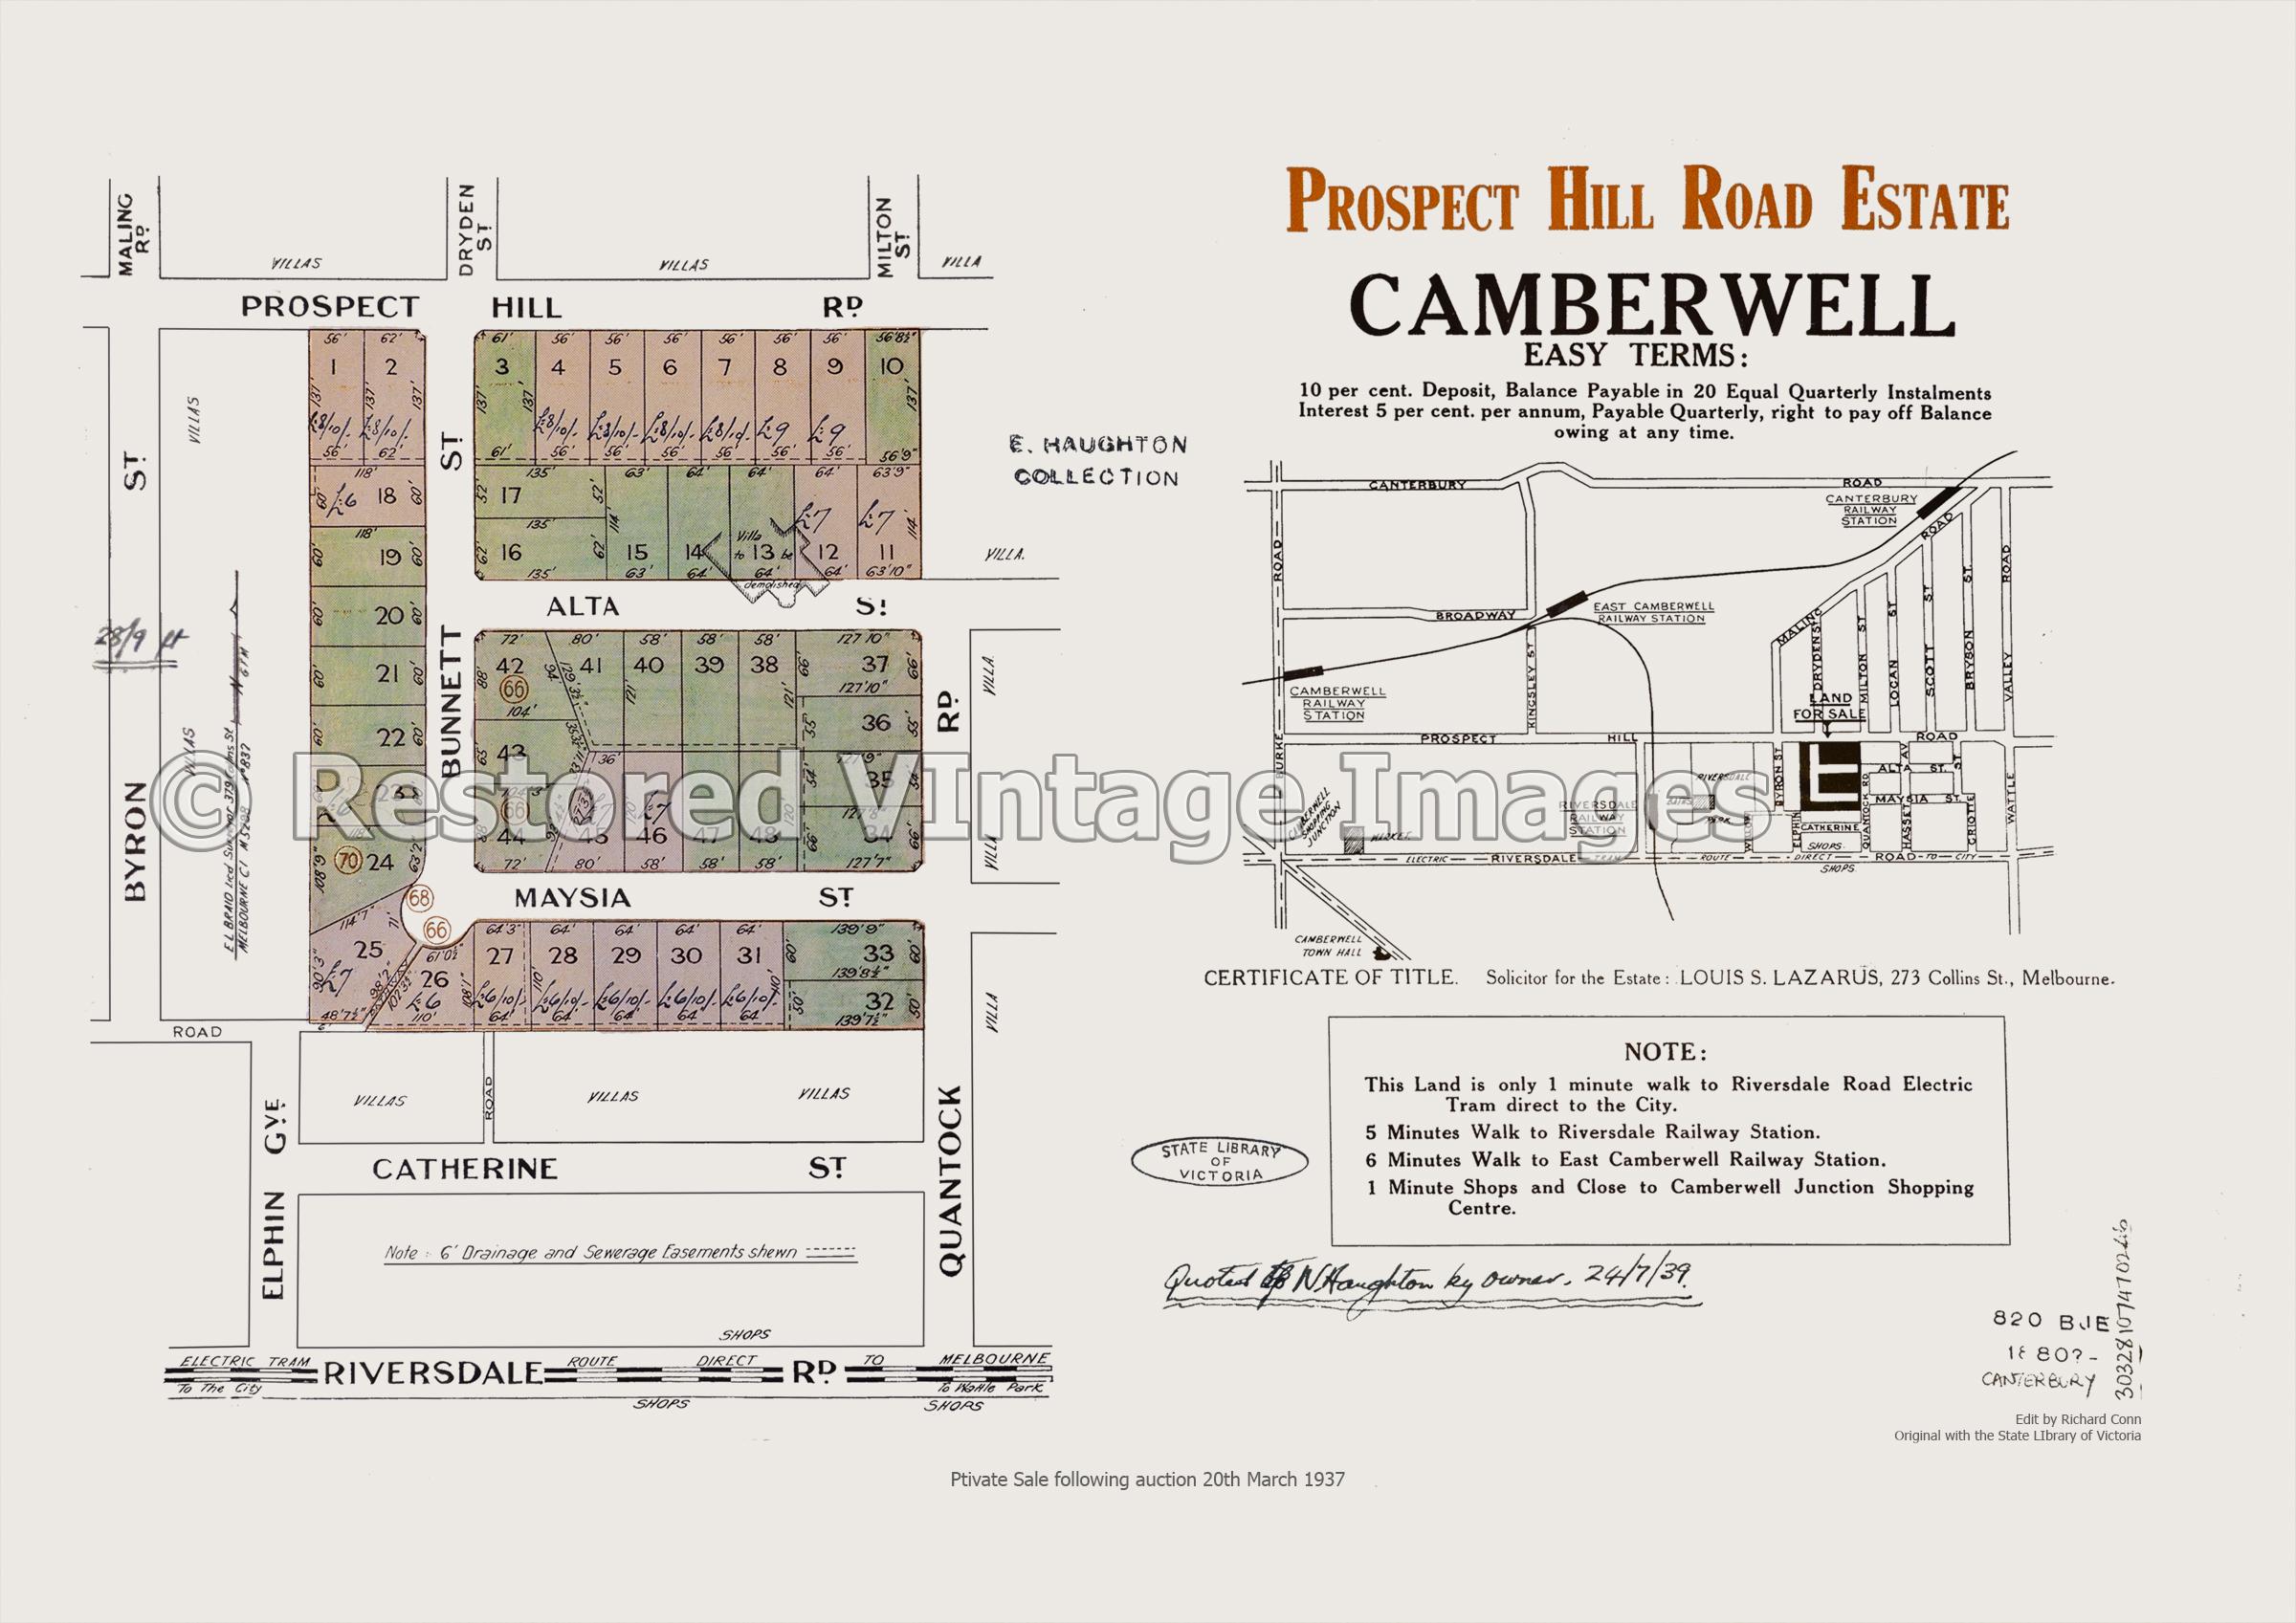 Prospect Hill Road Estate Camberwell 20th March 1937 – Canterbury